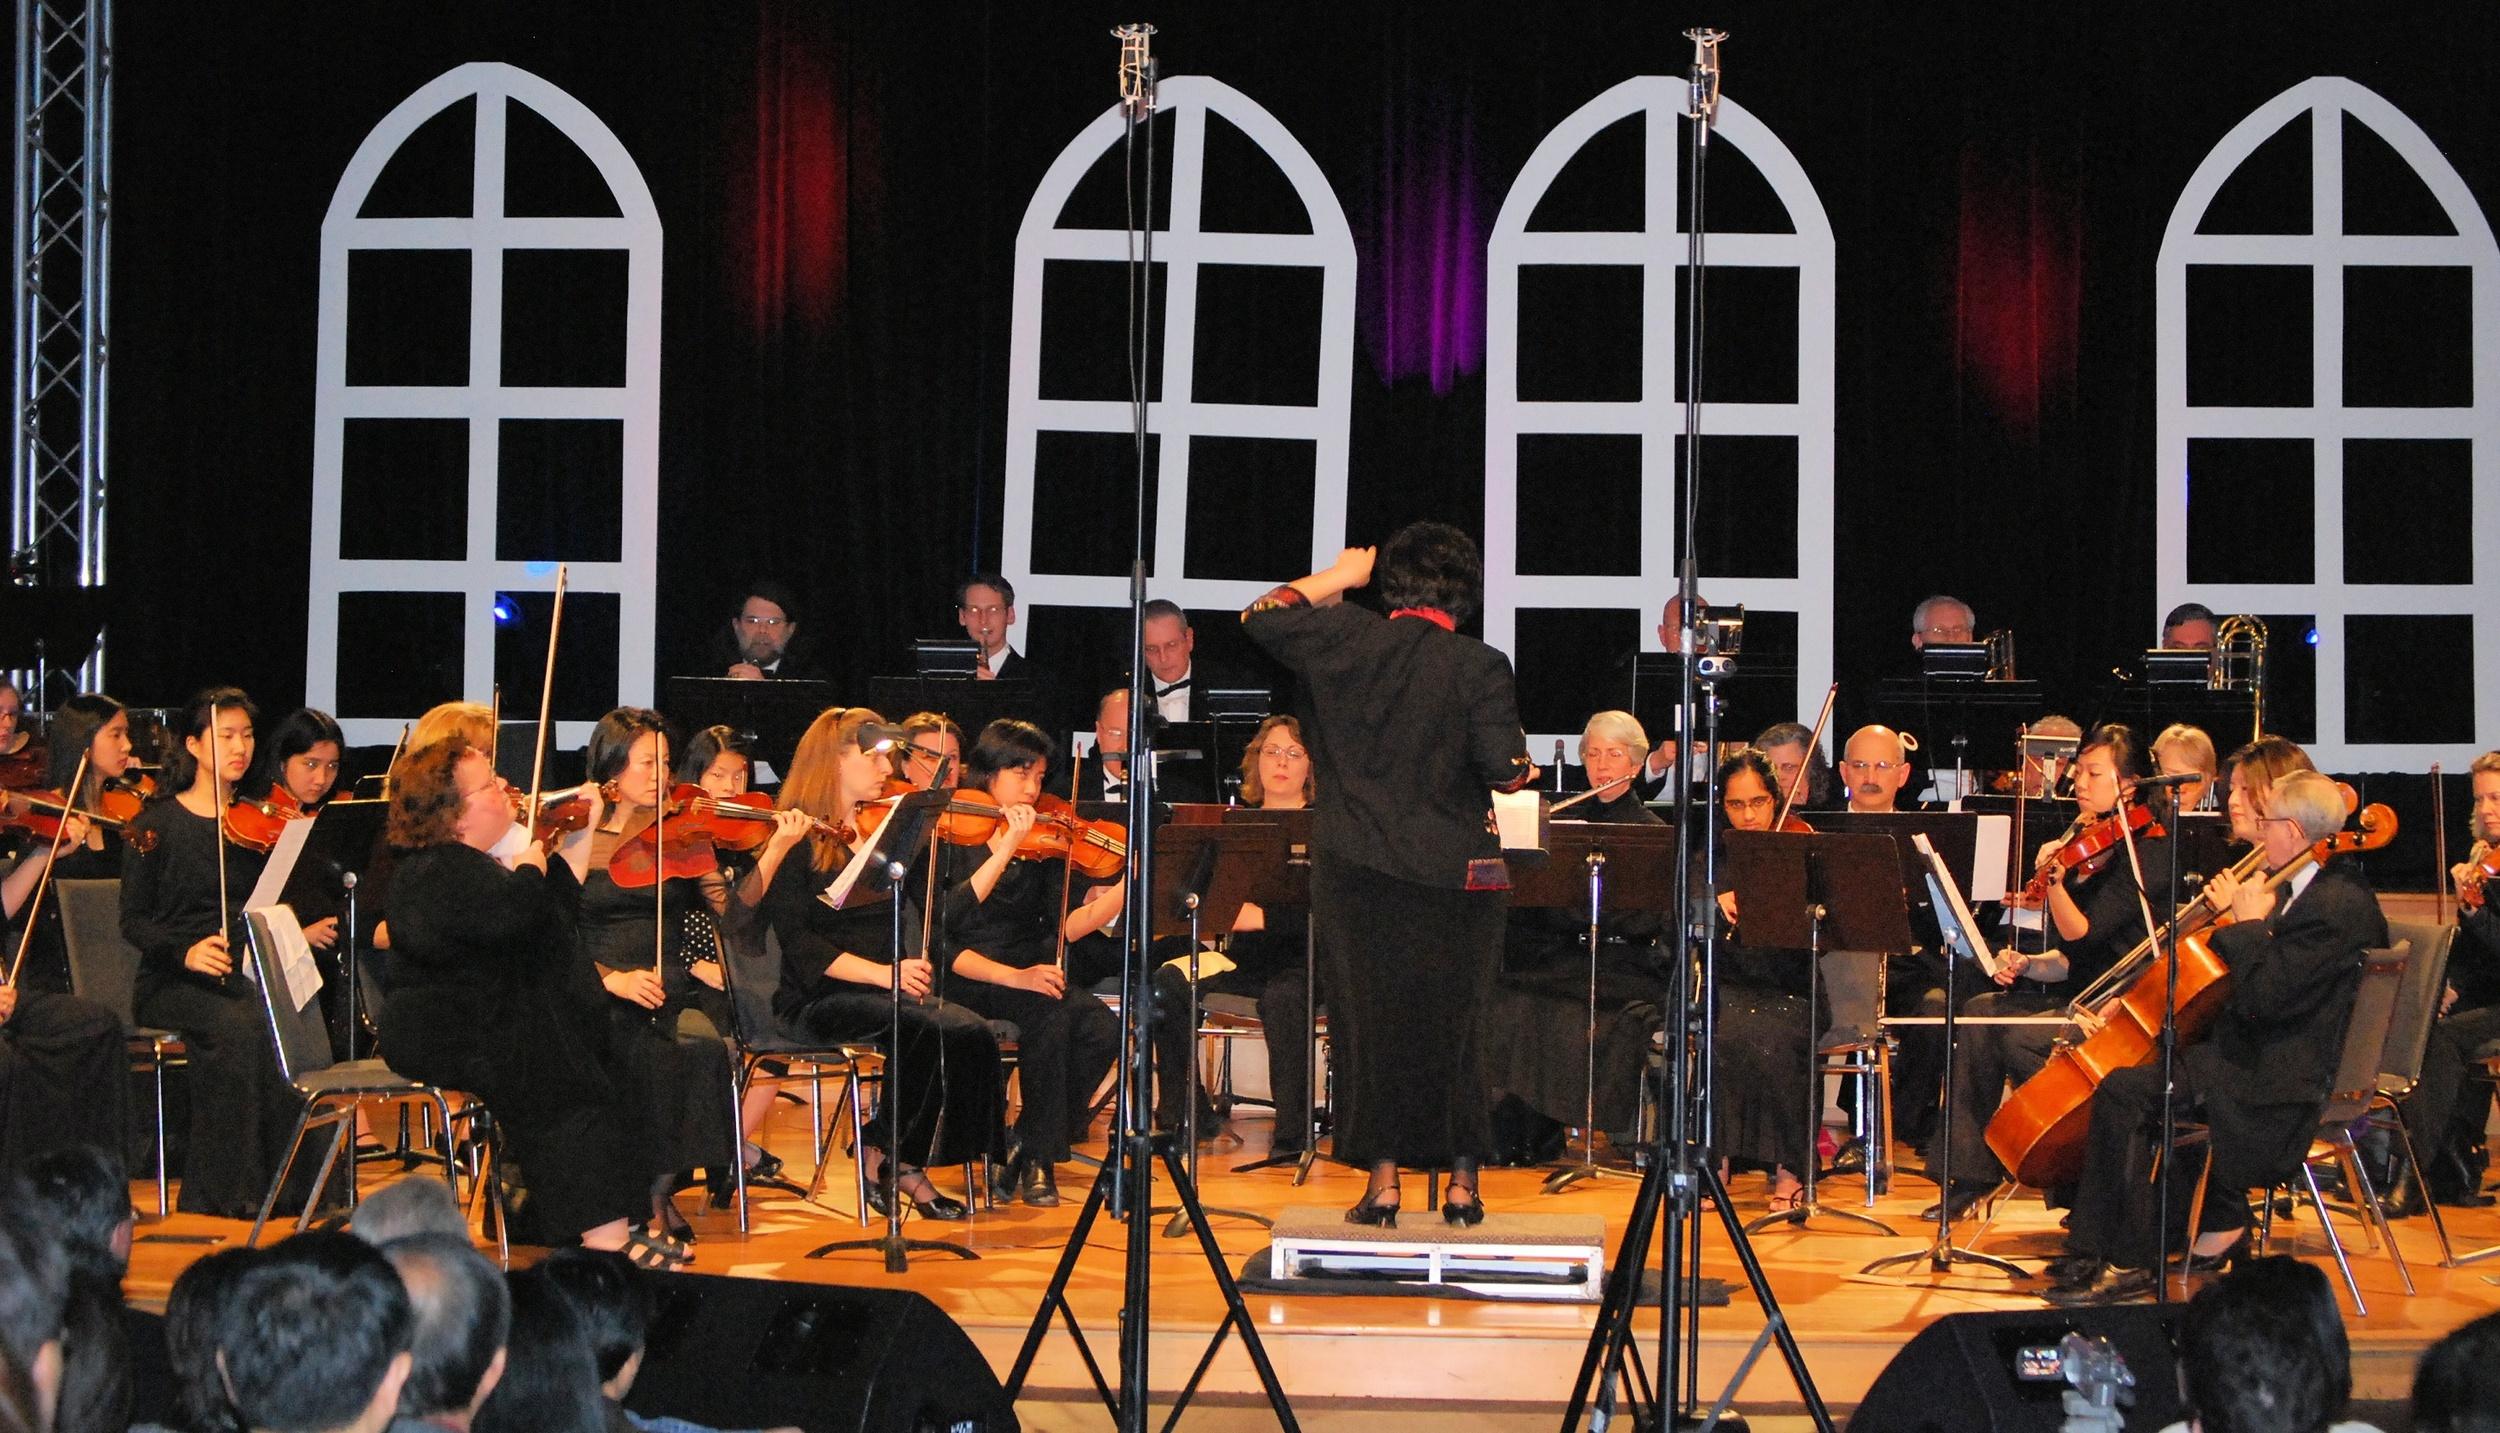 Orchestra performing Tchaikovsky Symphony No. 4